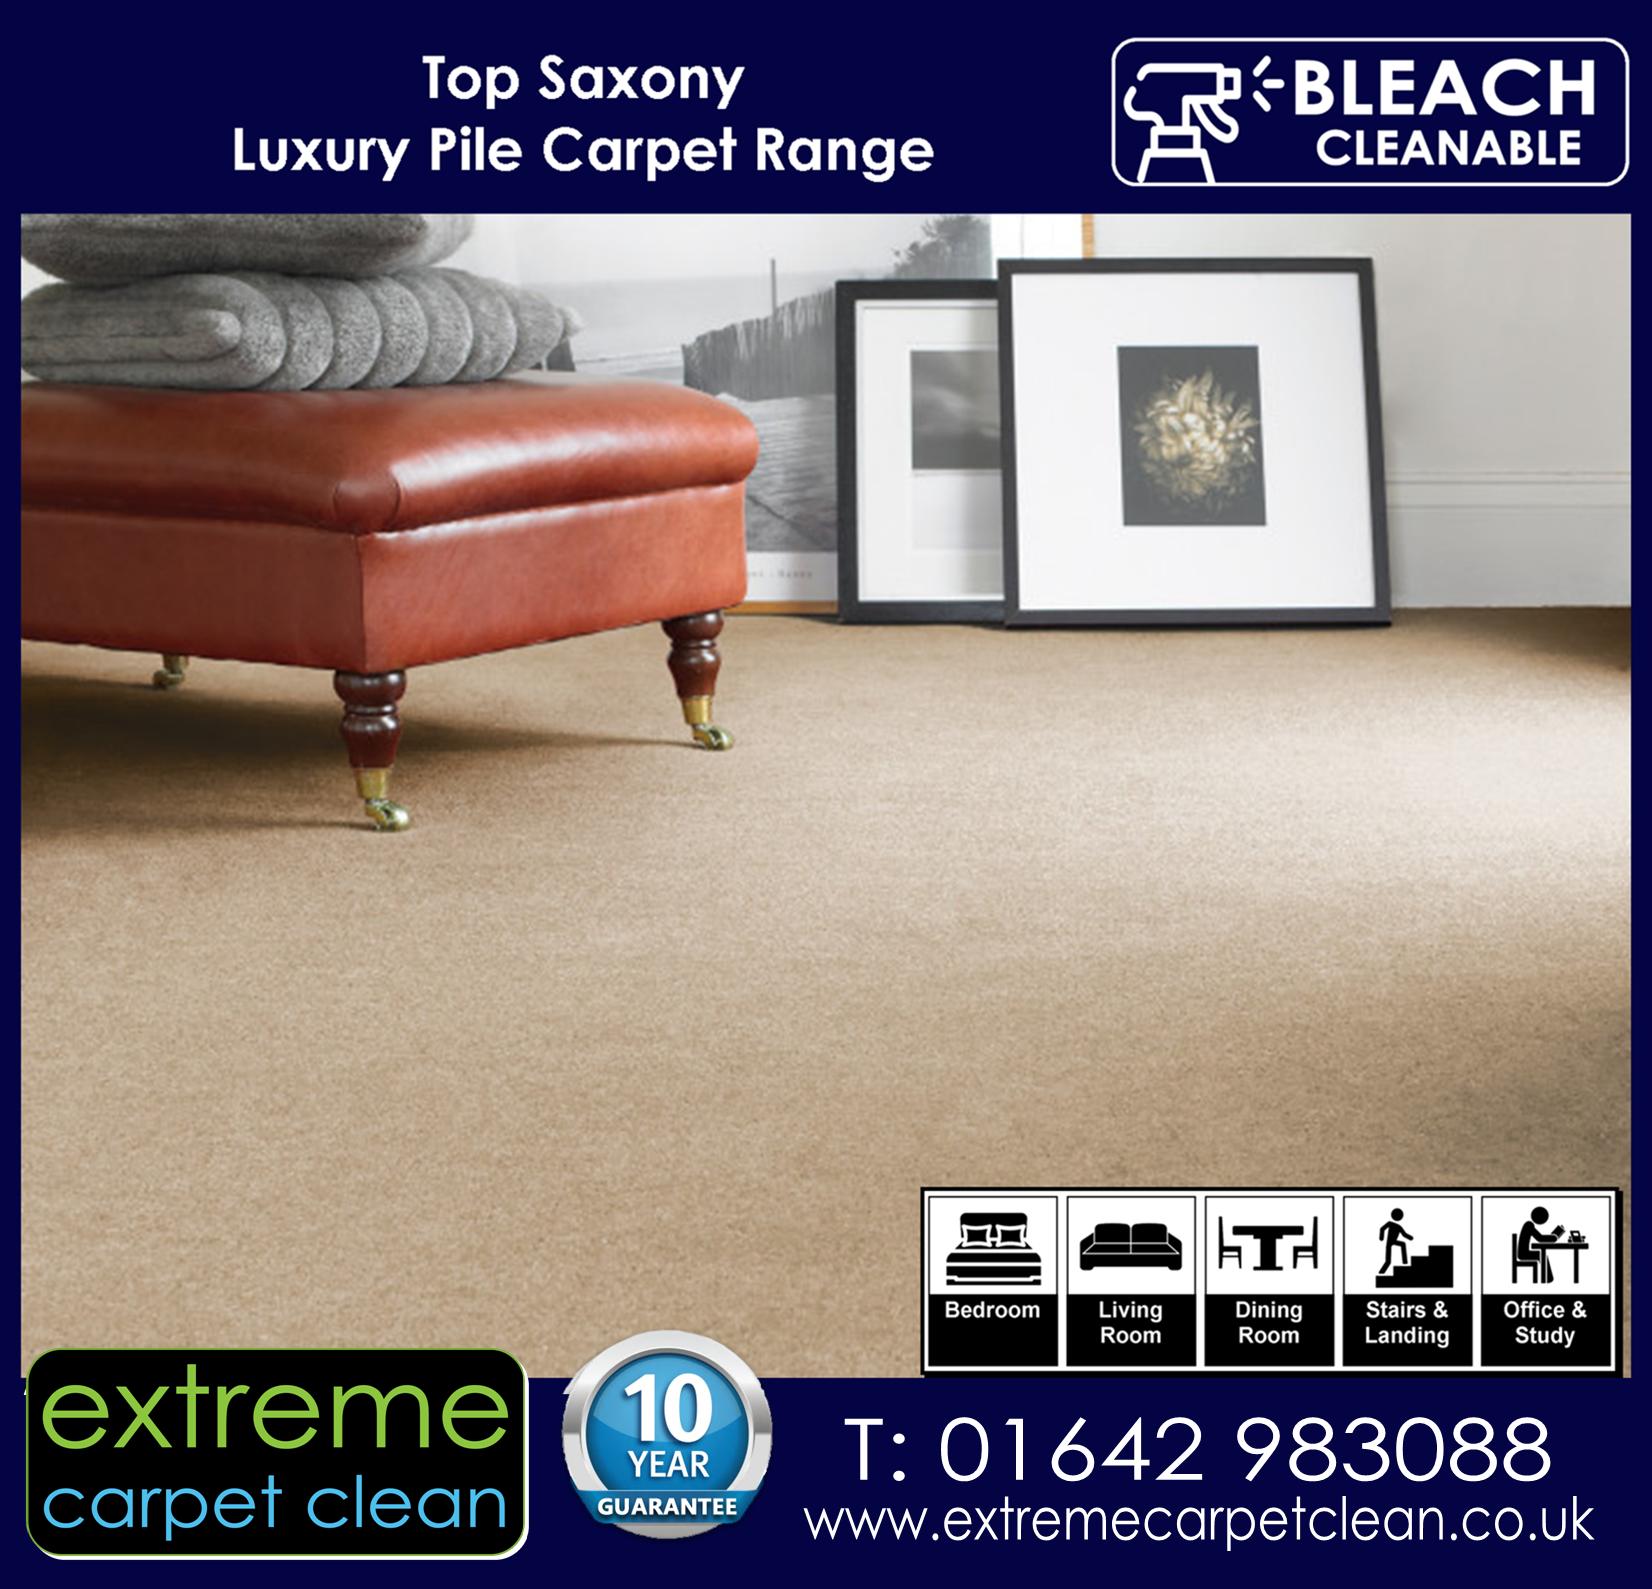 Extreme Carpet Clean in Middlesbrough, Top Saxony Luxury Pile Carpet Range